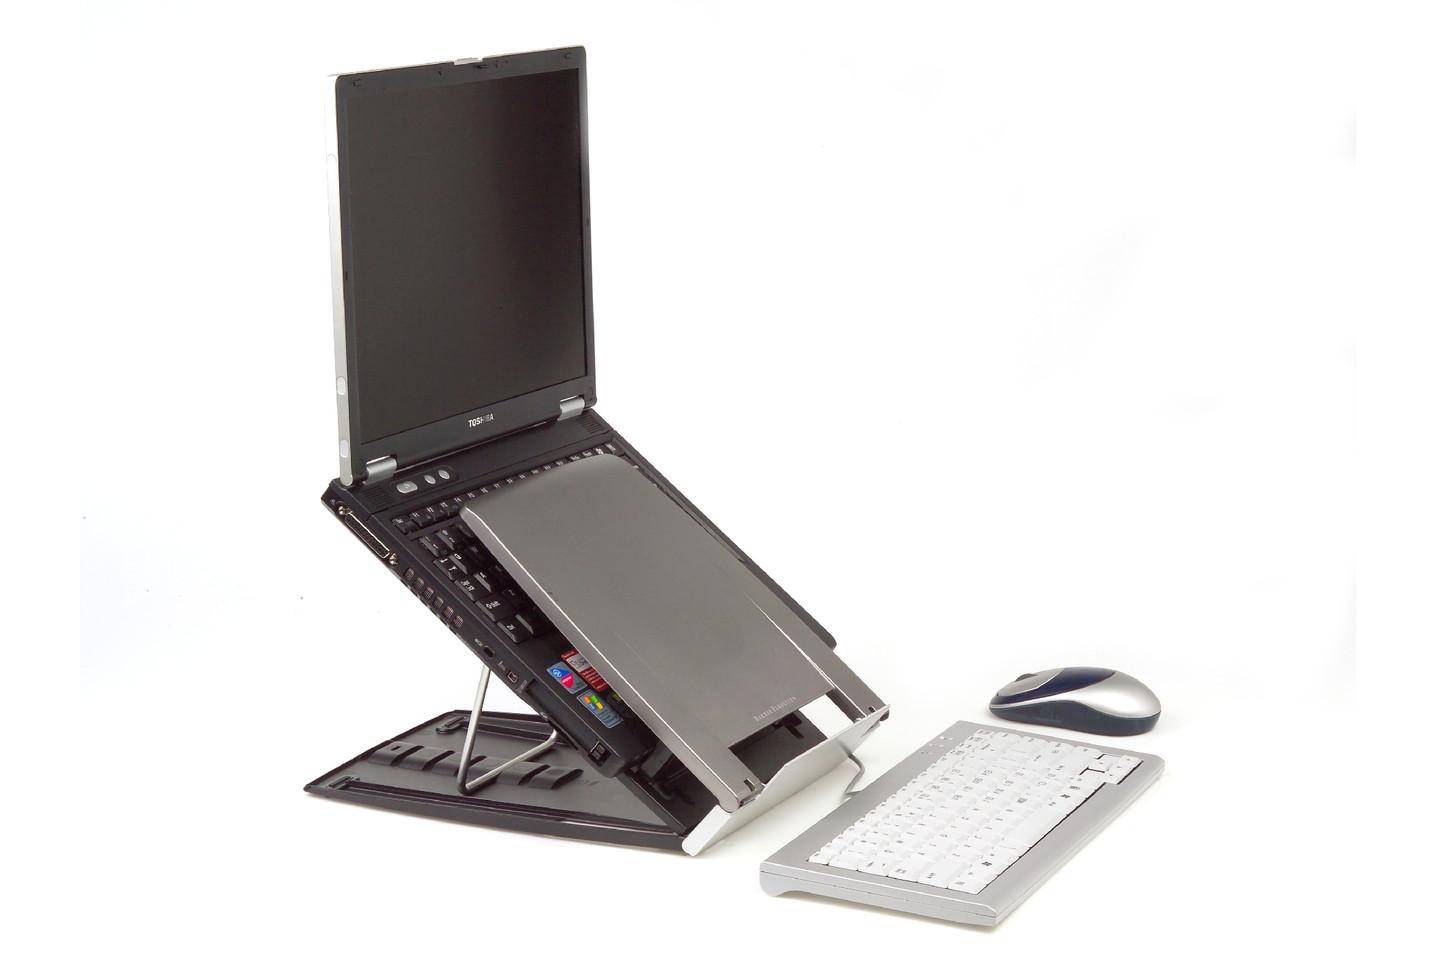 ergo-q-330-notebook-stand-1395147978.jpg